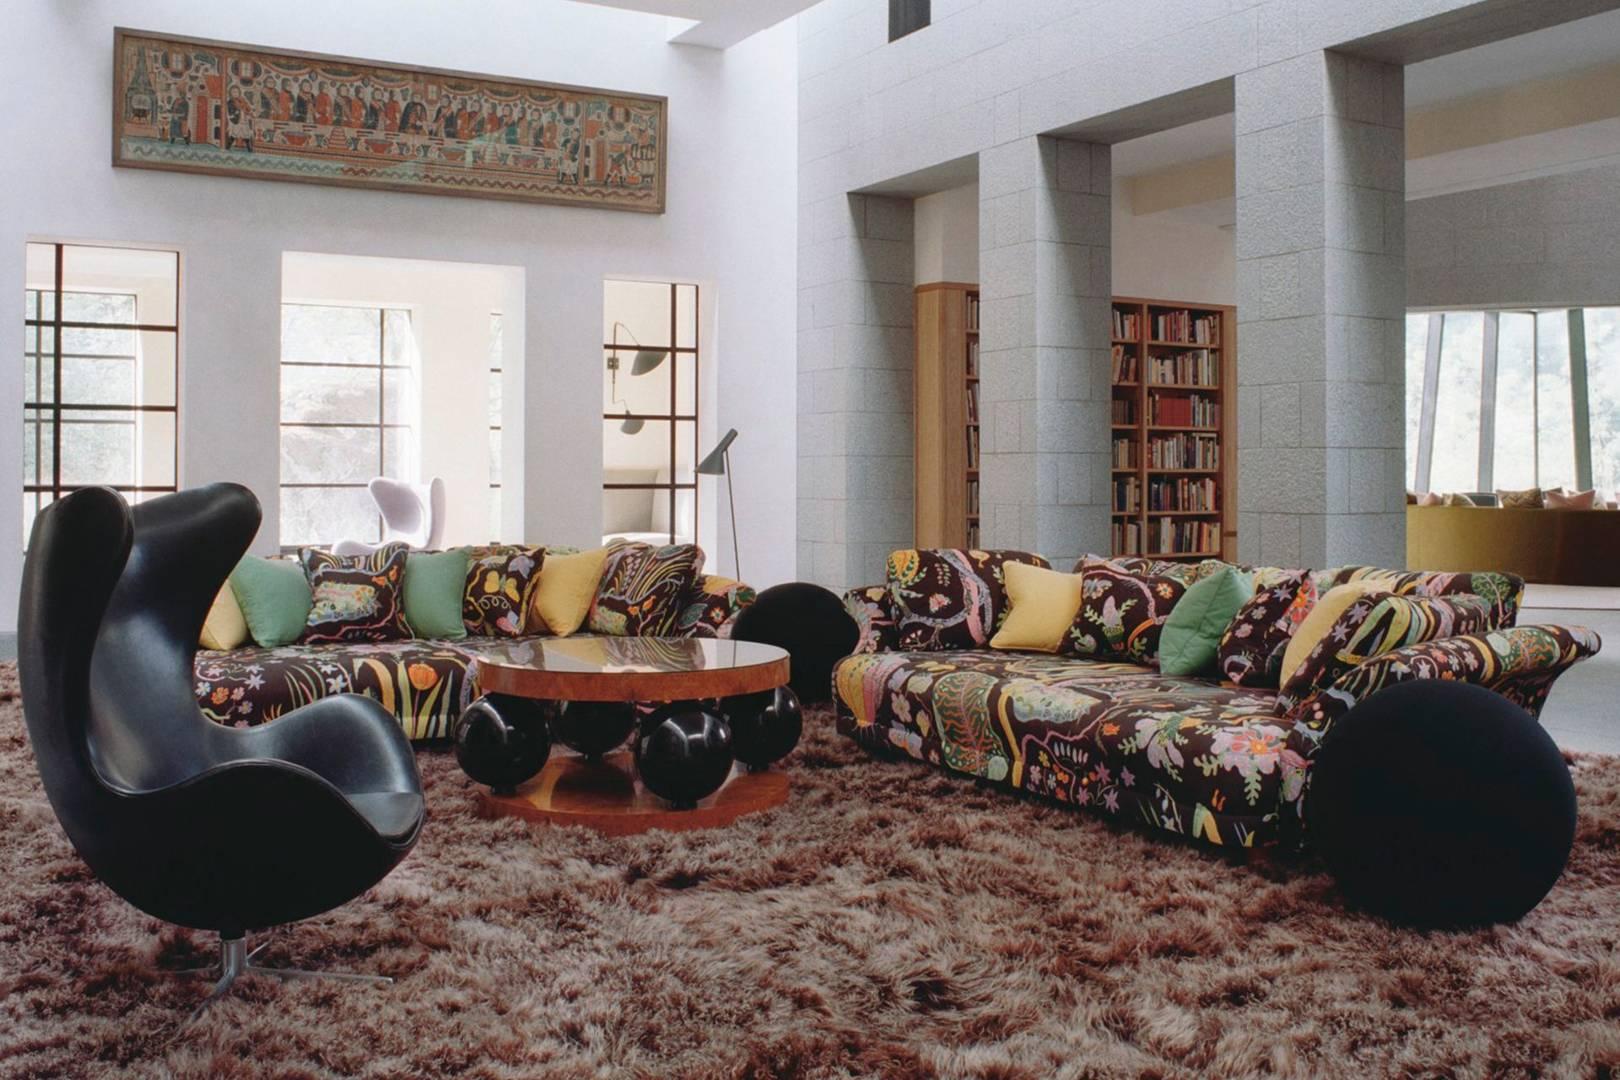 Vogue textiles and home decor